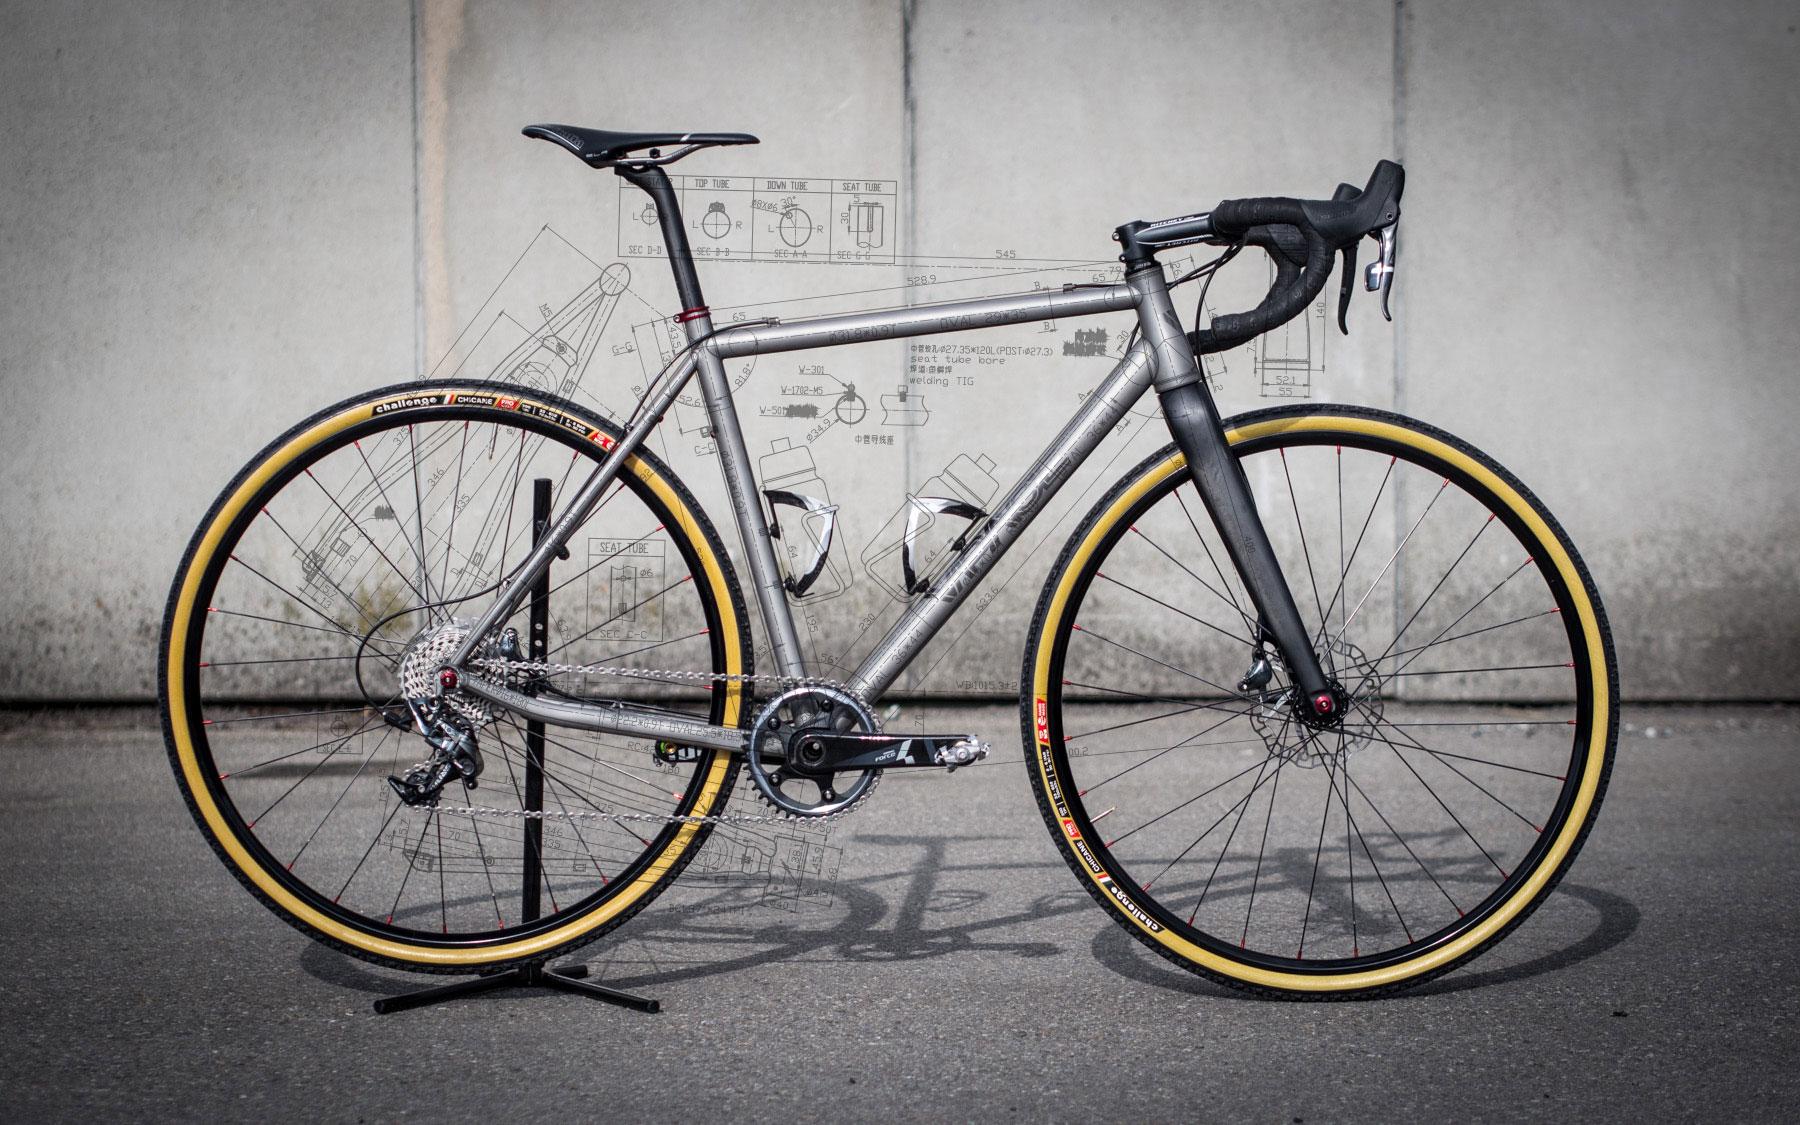 NEU - TCX Titan Cyclocross Rahmen - VPACE Bikes